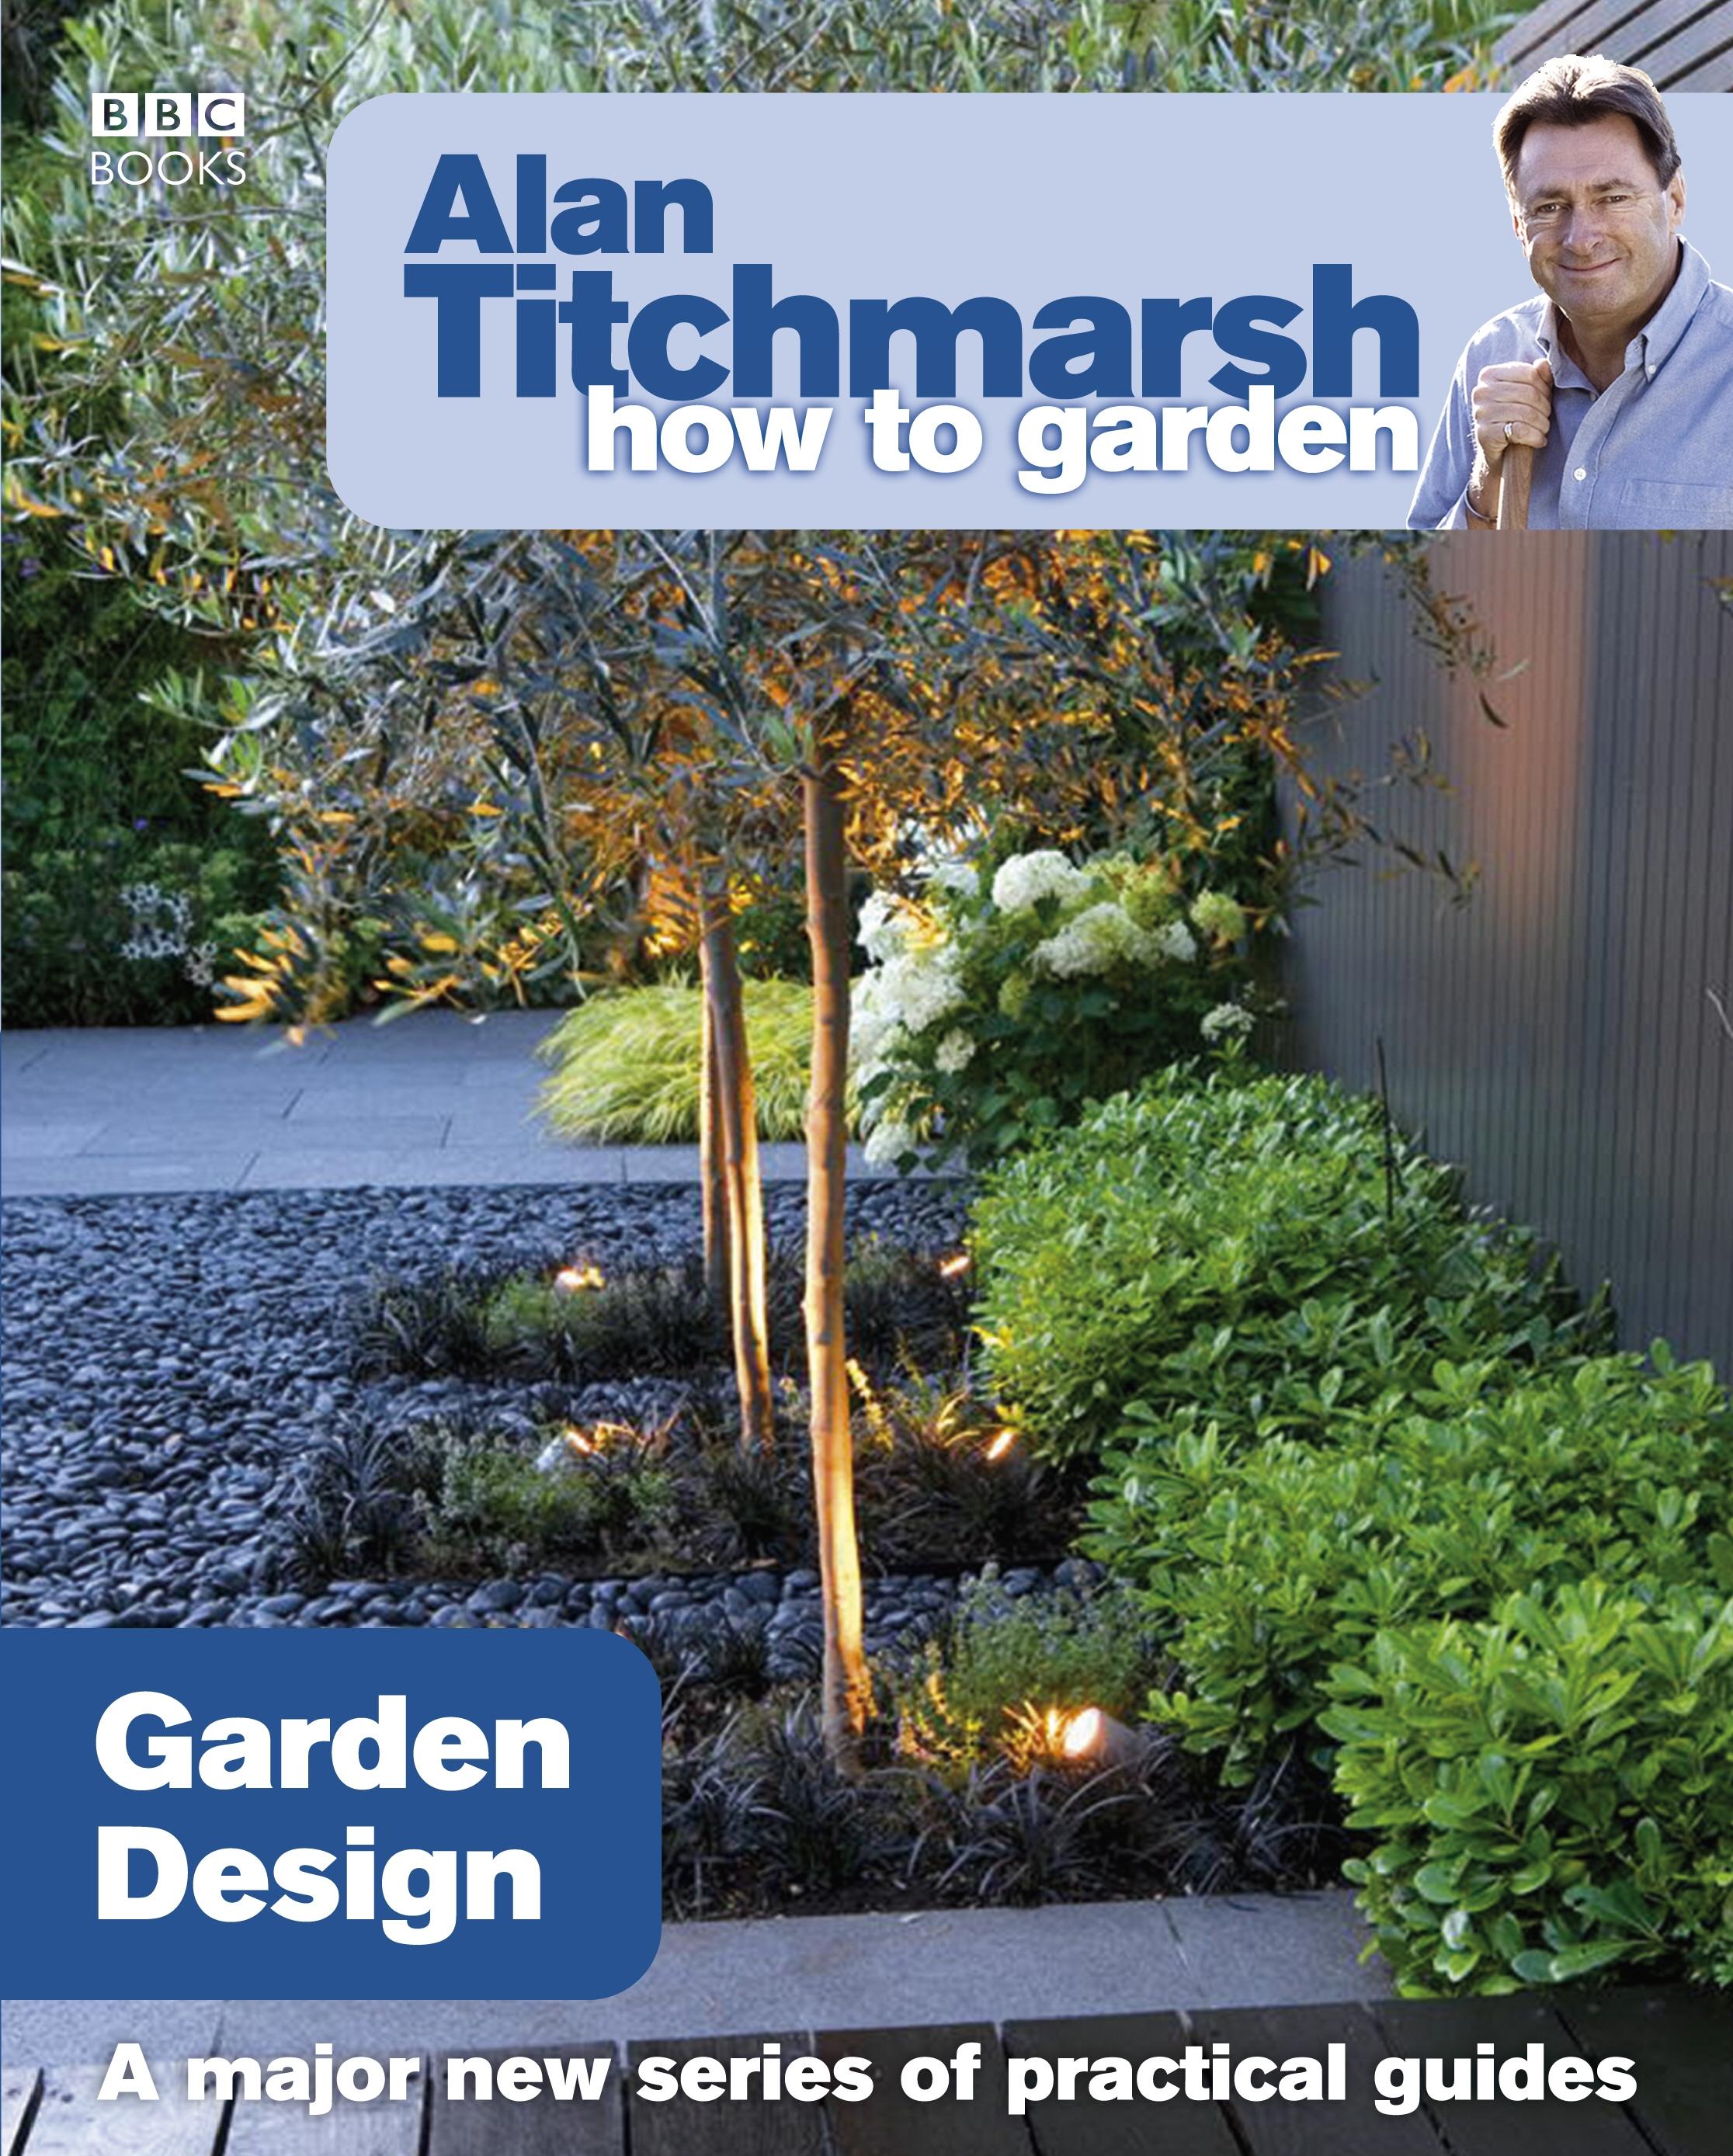 Alan Titchmarsh How to Garden Garden Design by Alan Titchmarsh